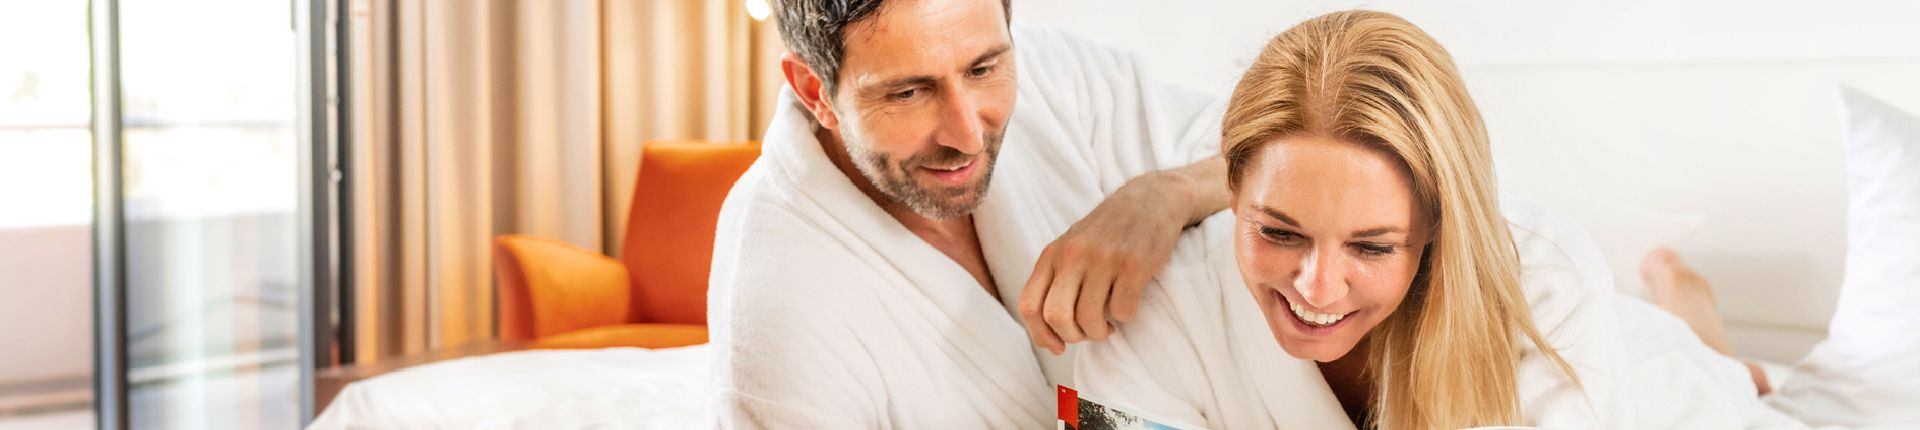 Pauschalen und Wellness